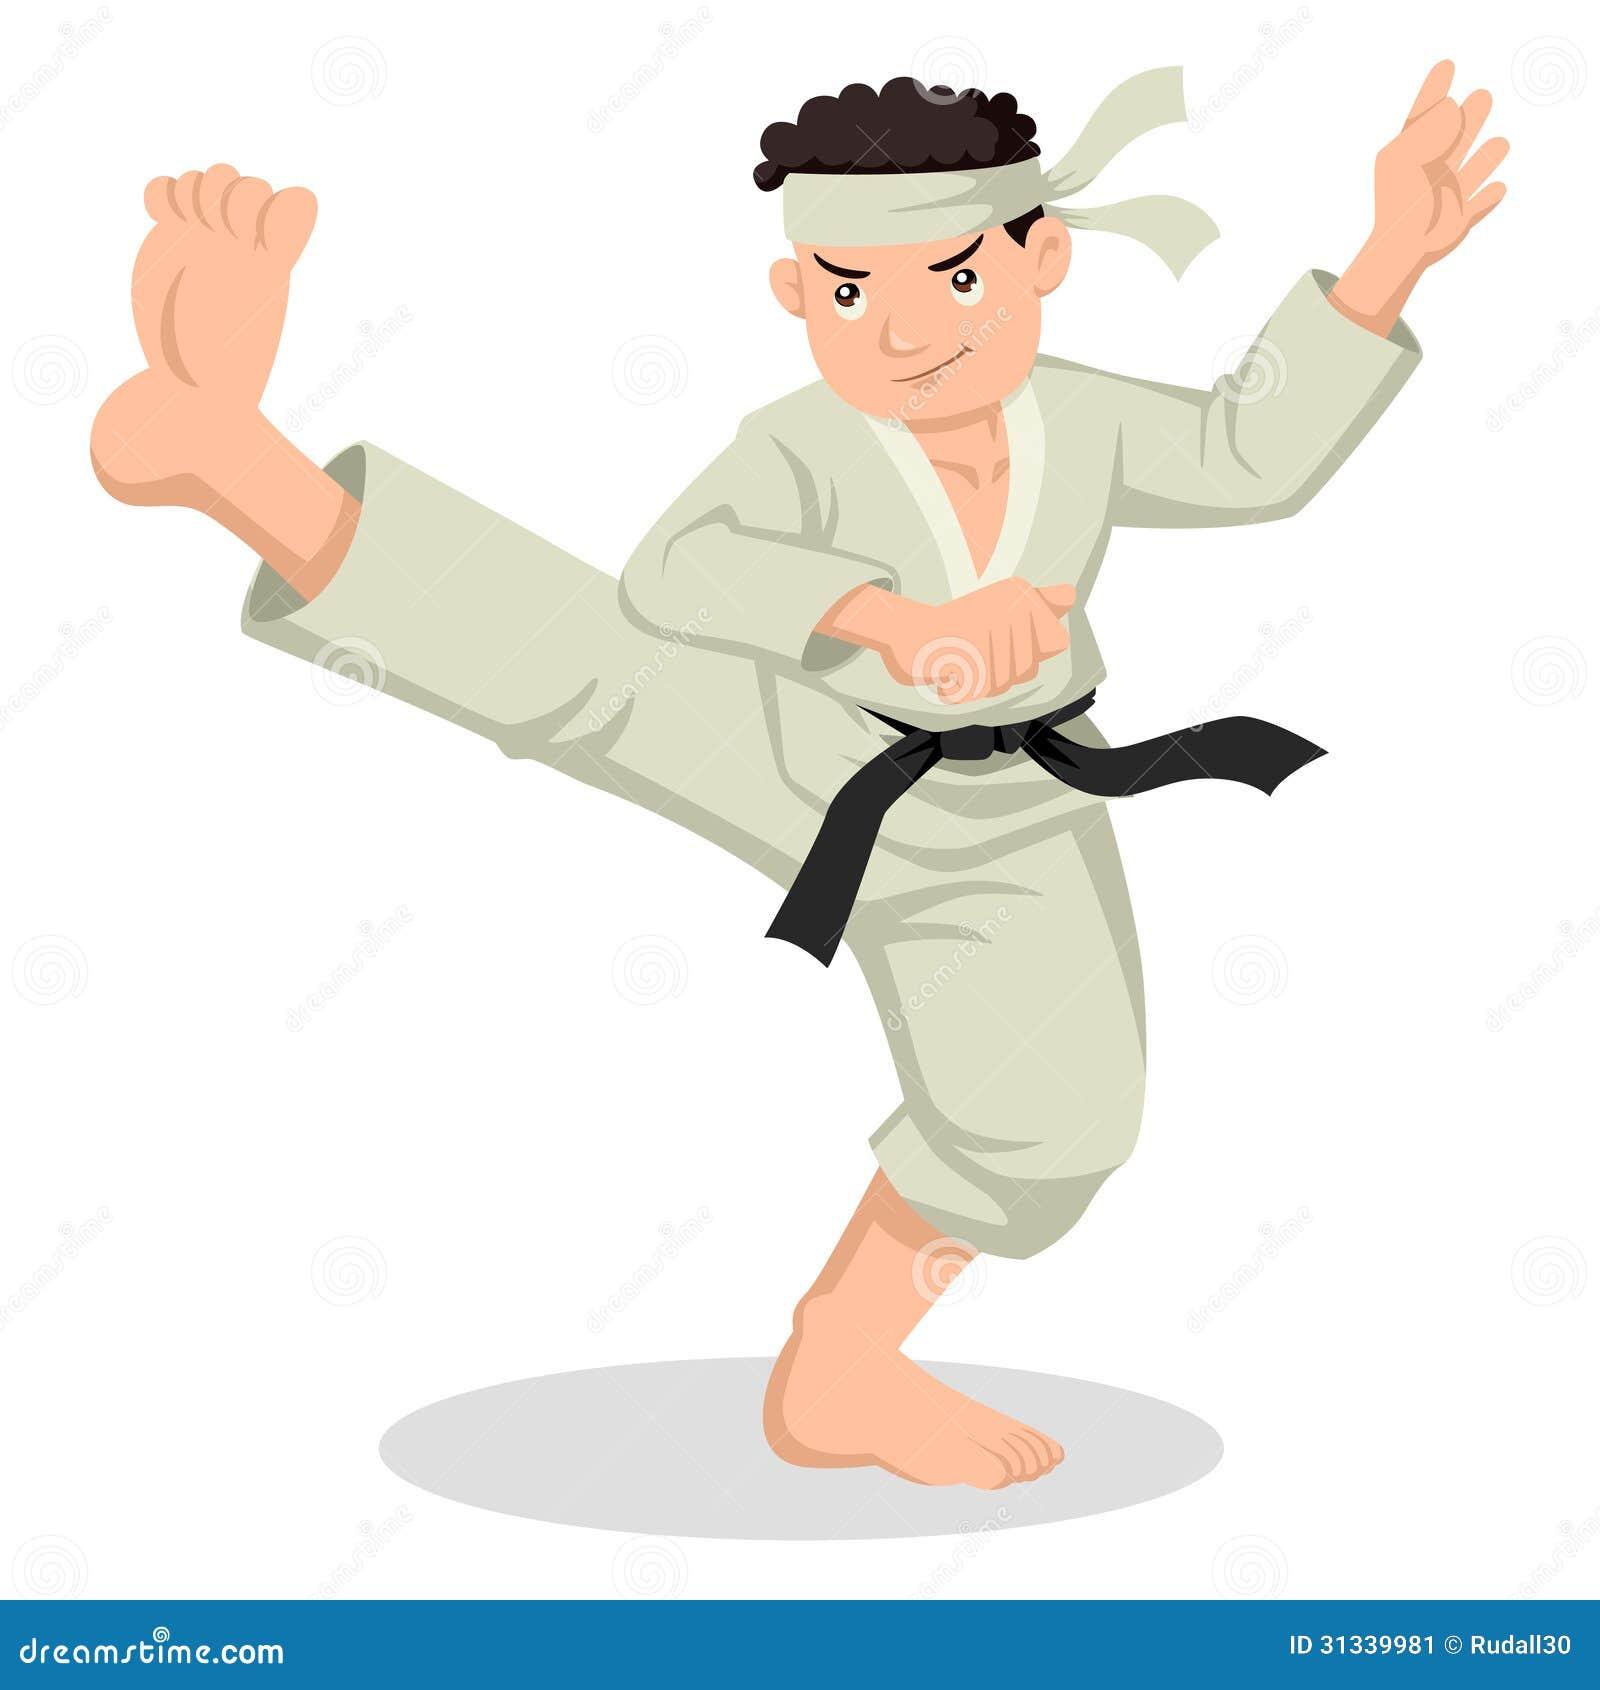 Cartoon illustration of boy kicking in martial art suit Black Karate Cartoon